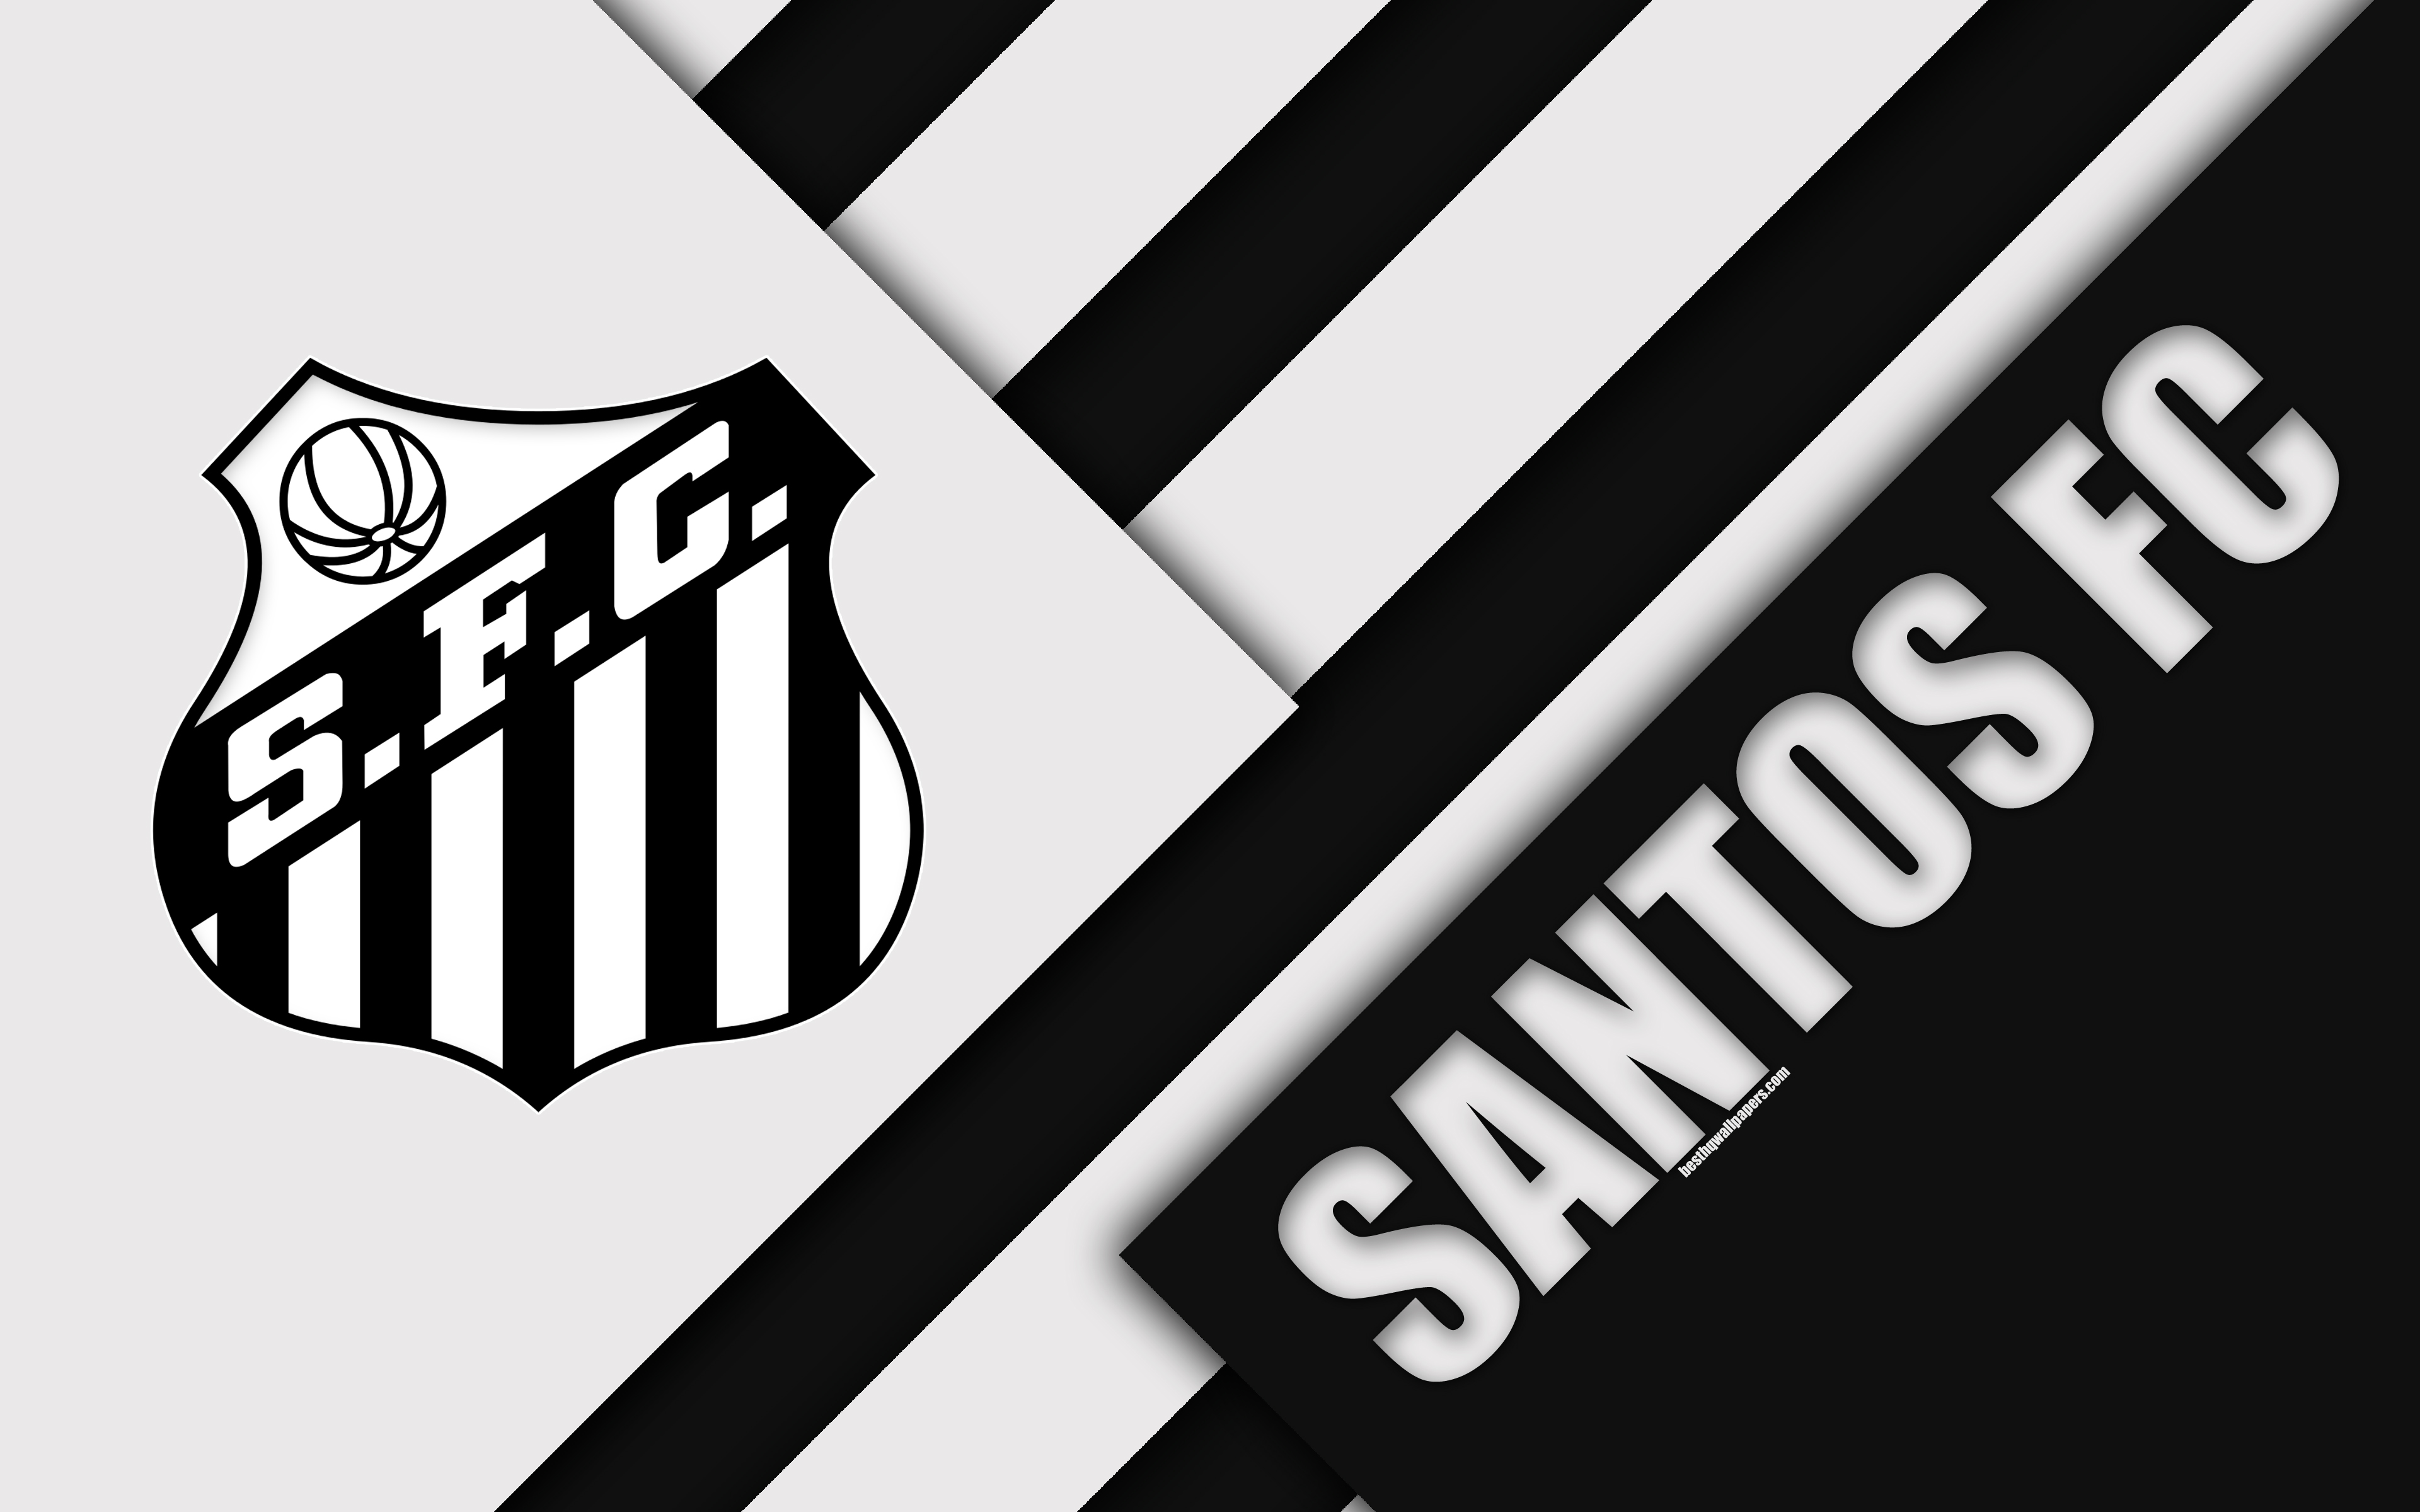 Download wallpapers Santos FC So Paulo Brazil 4k material 3840x2400